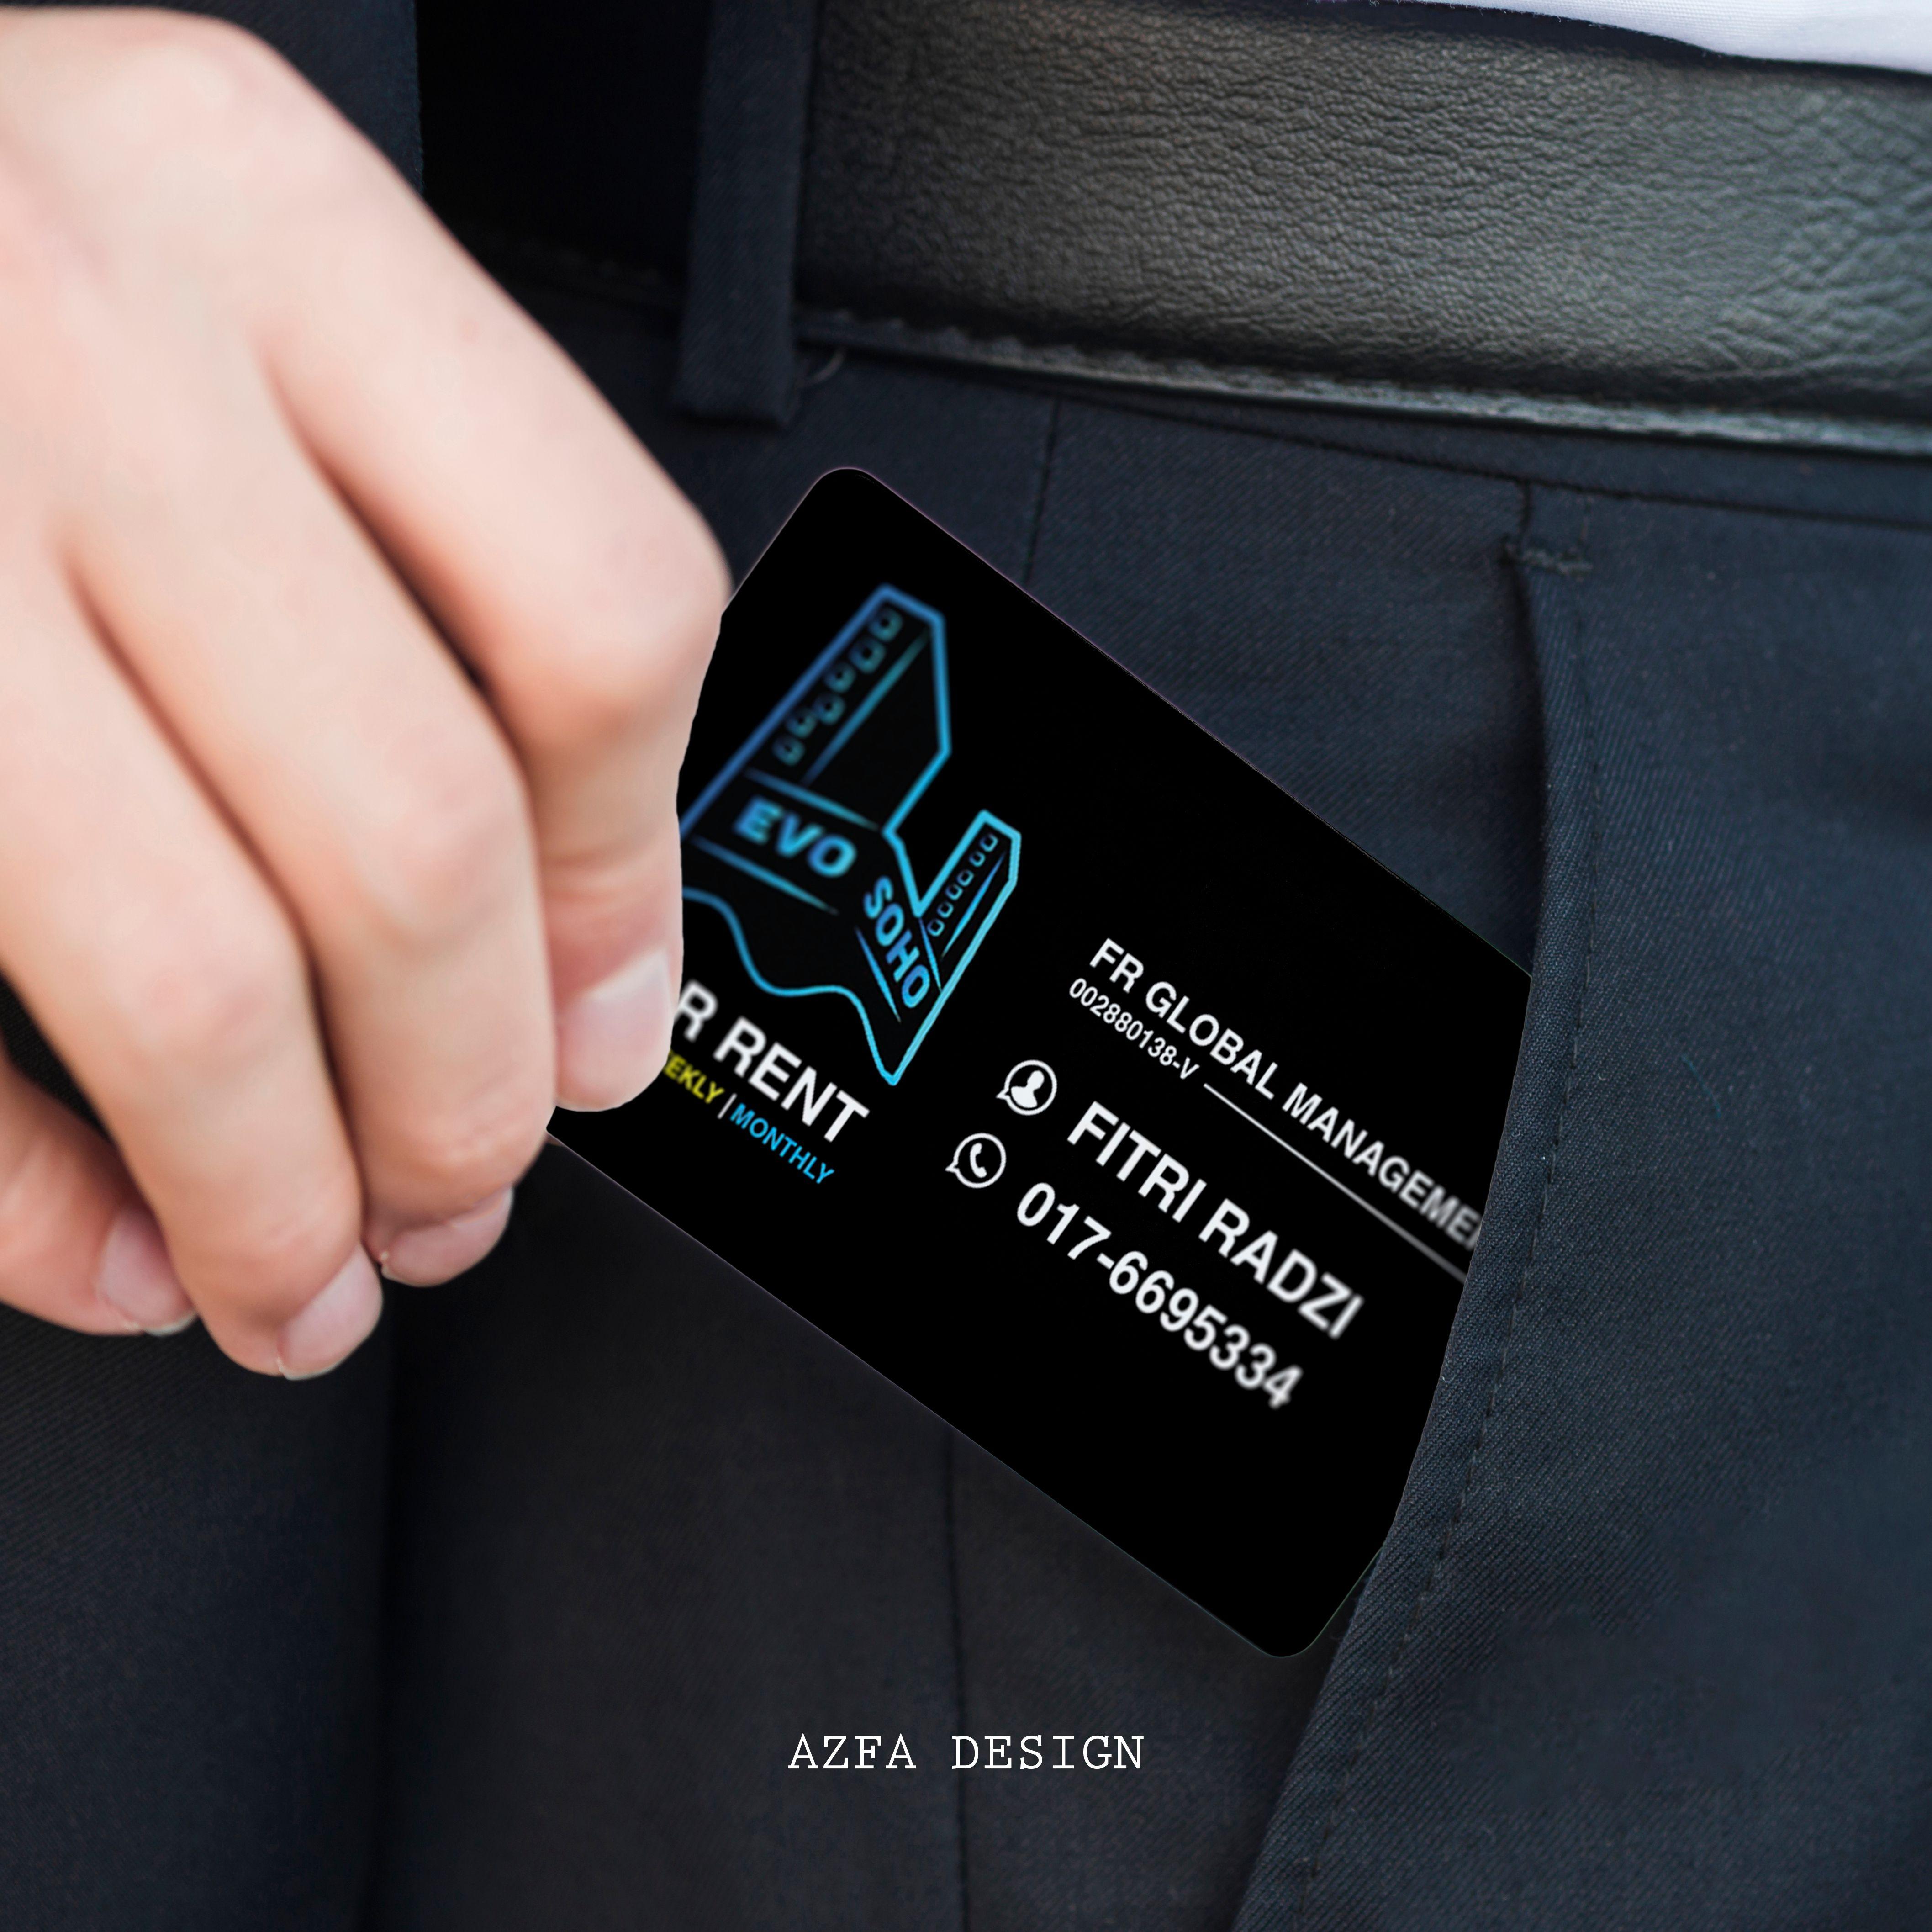 Azfadesign Bisneskad Bisnes Kad Bisnes Kad Belum Ada Lagi Ke Saya Nak Buat Tapi Budget Tak Ada La Place Card Holders Cards Place Cards